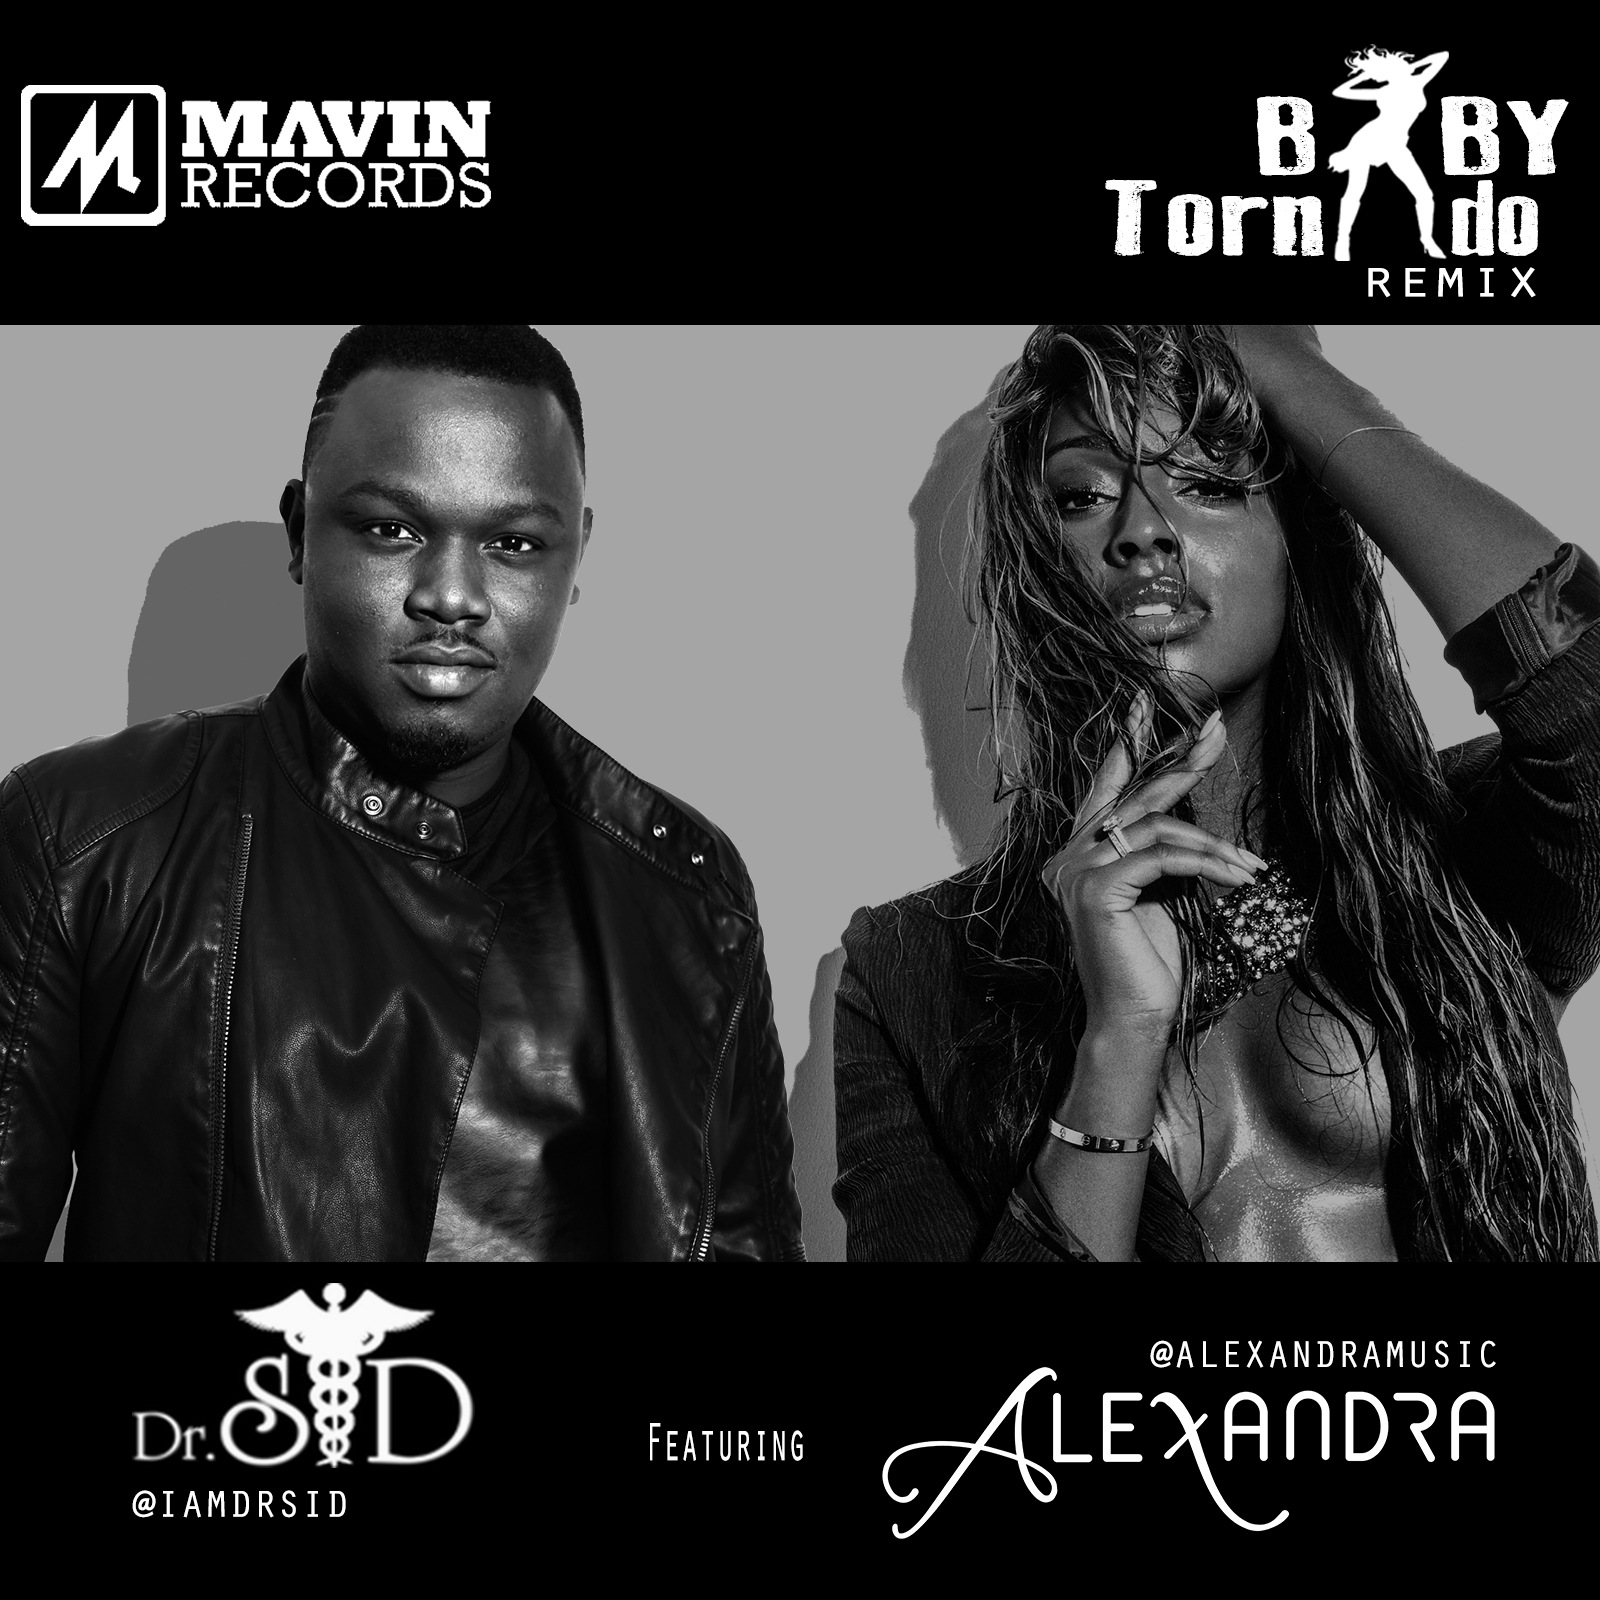 Dr SID – Baby Tornado (Remix) ft Alexandra Burke